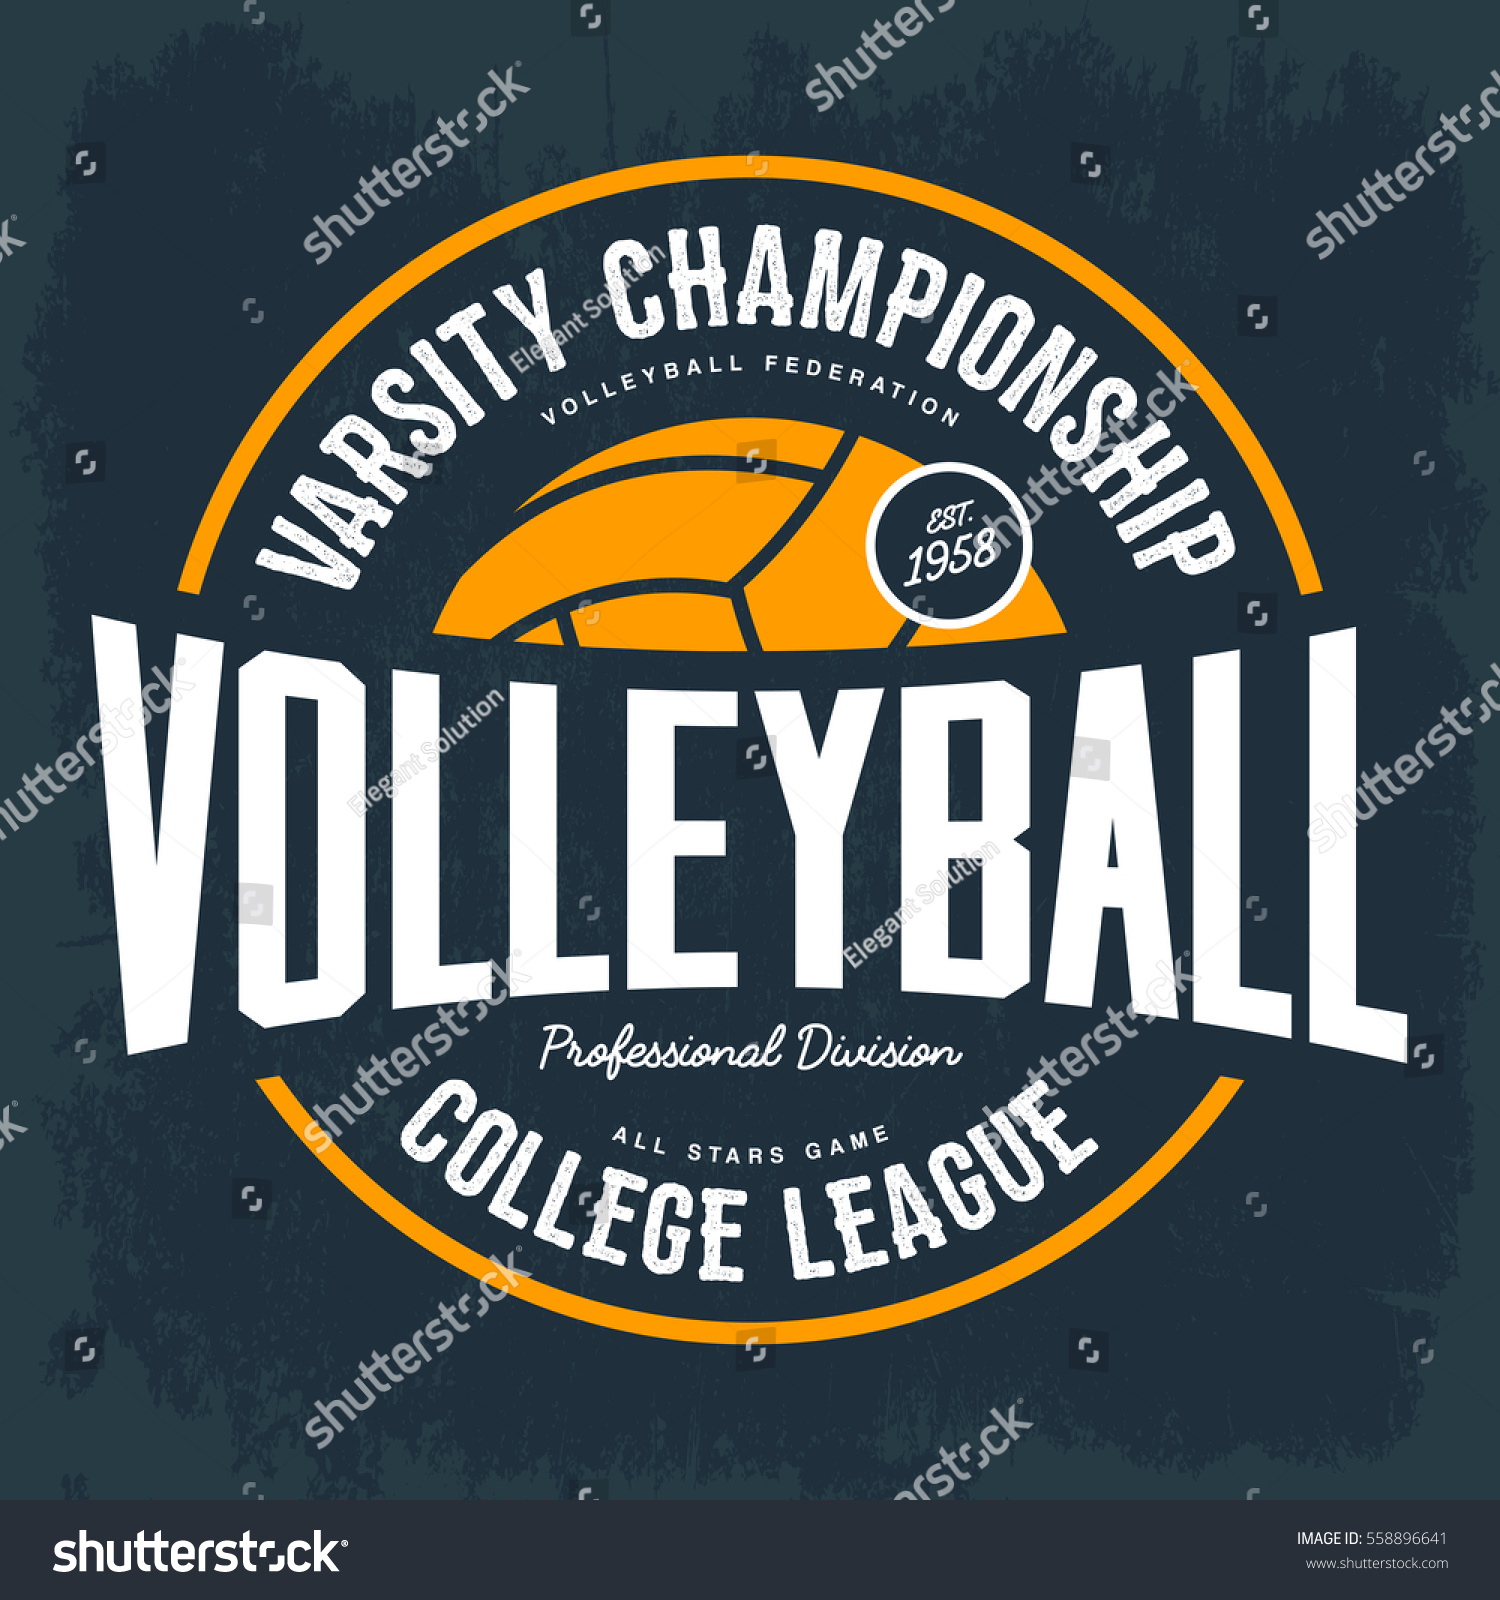 volleyball ball logo college tournament tshirt stock vector